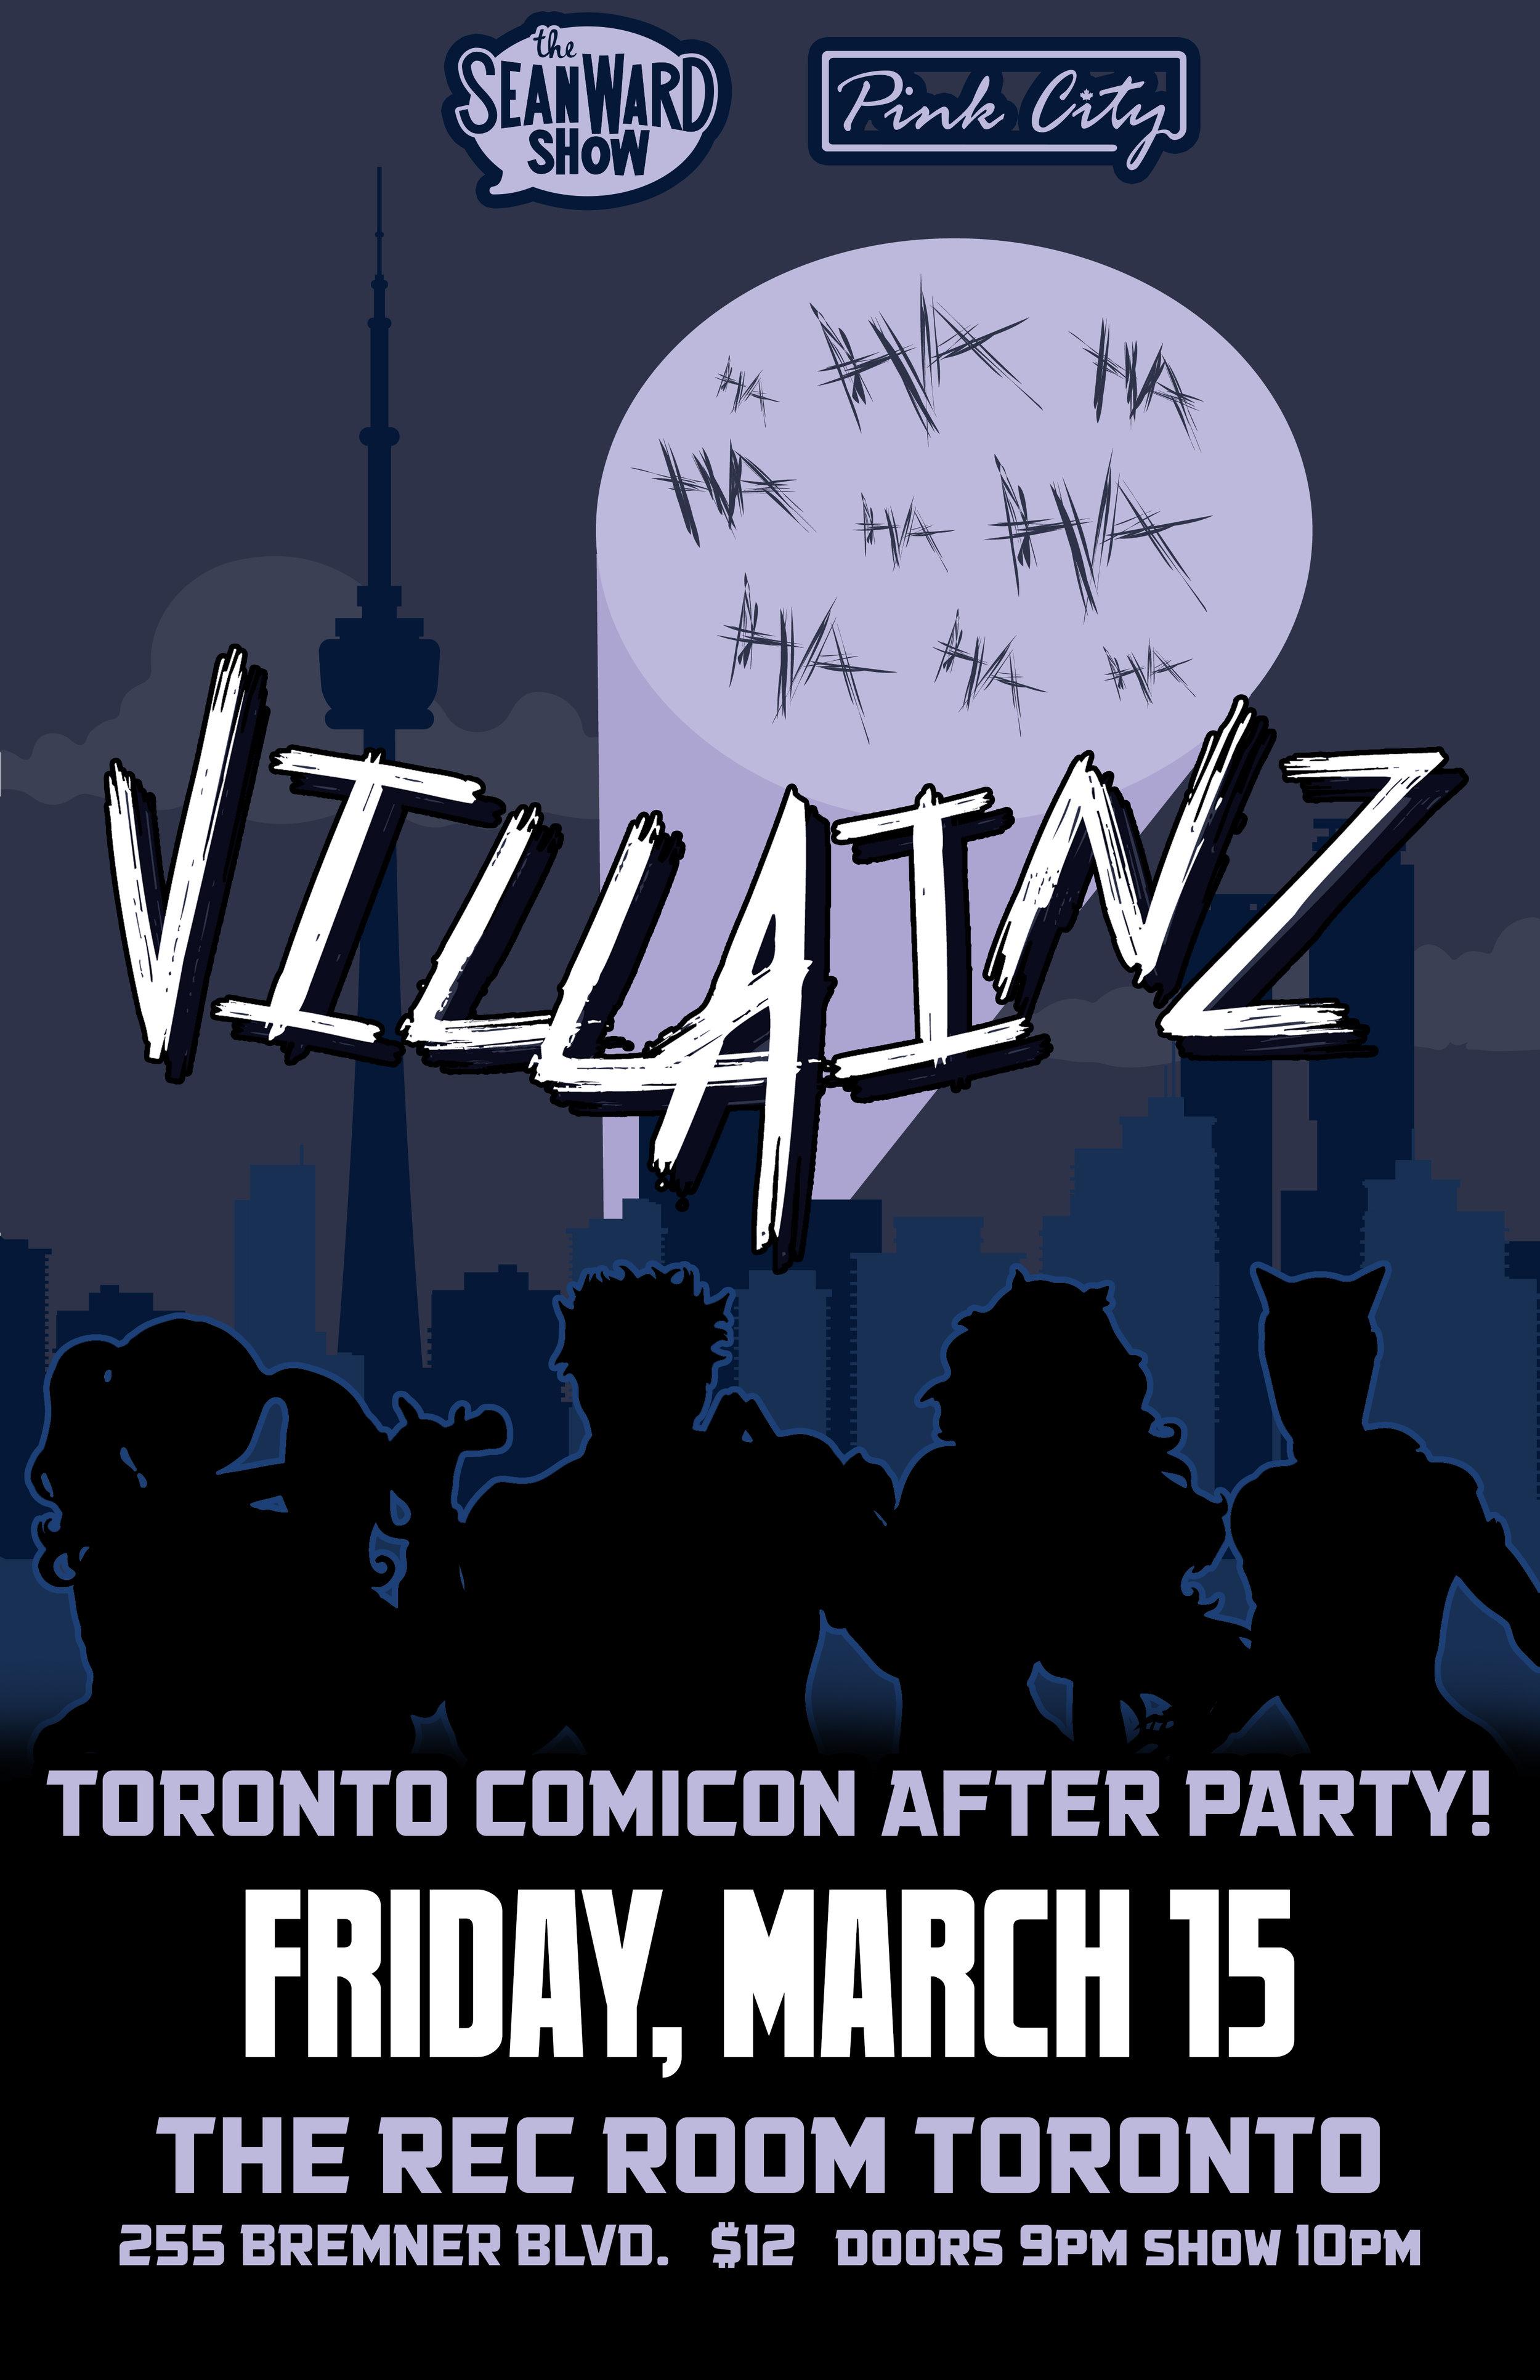 villainz poster hi-res flat version.jpg